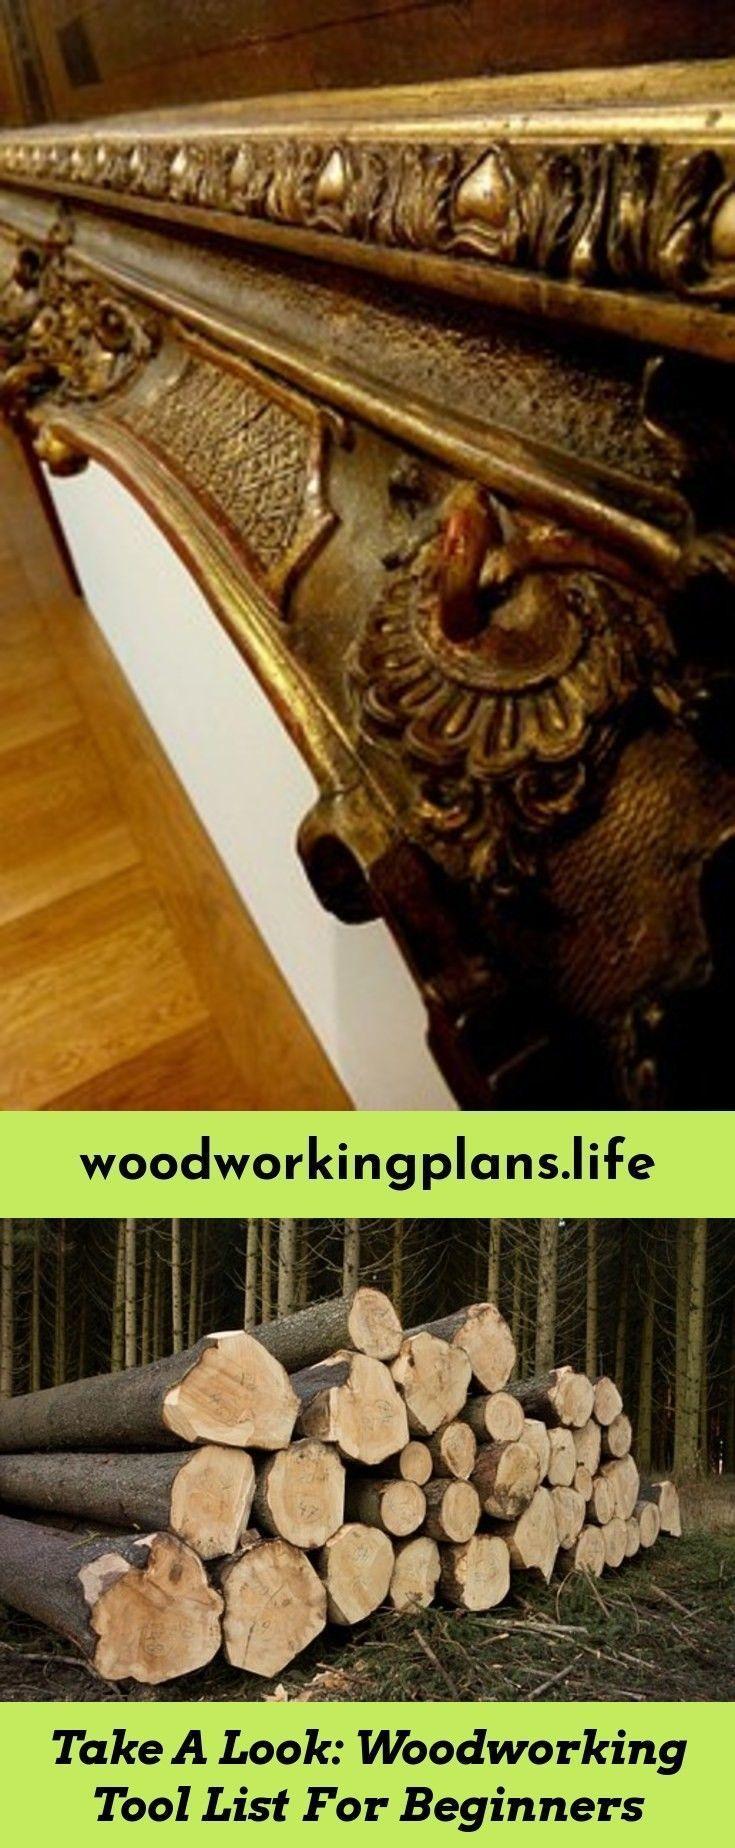 DIY Woodworking Ideas 10 Versatile Clever Ideas: Woodworking Cnc Youtube woodworking business people.Woodworking Table Saw fine woodworking stools.Woodworking Table Saw..